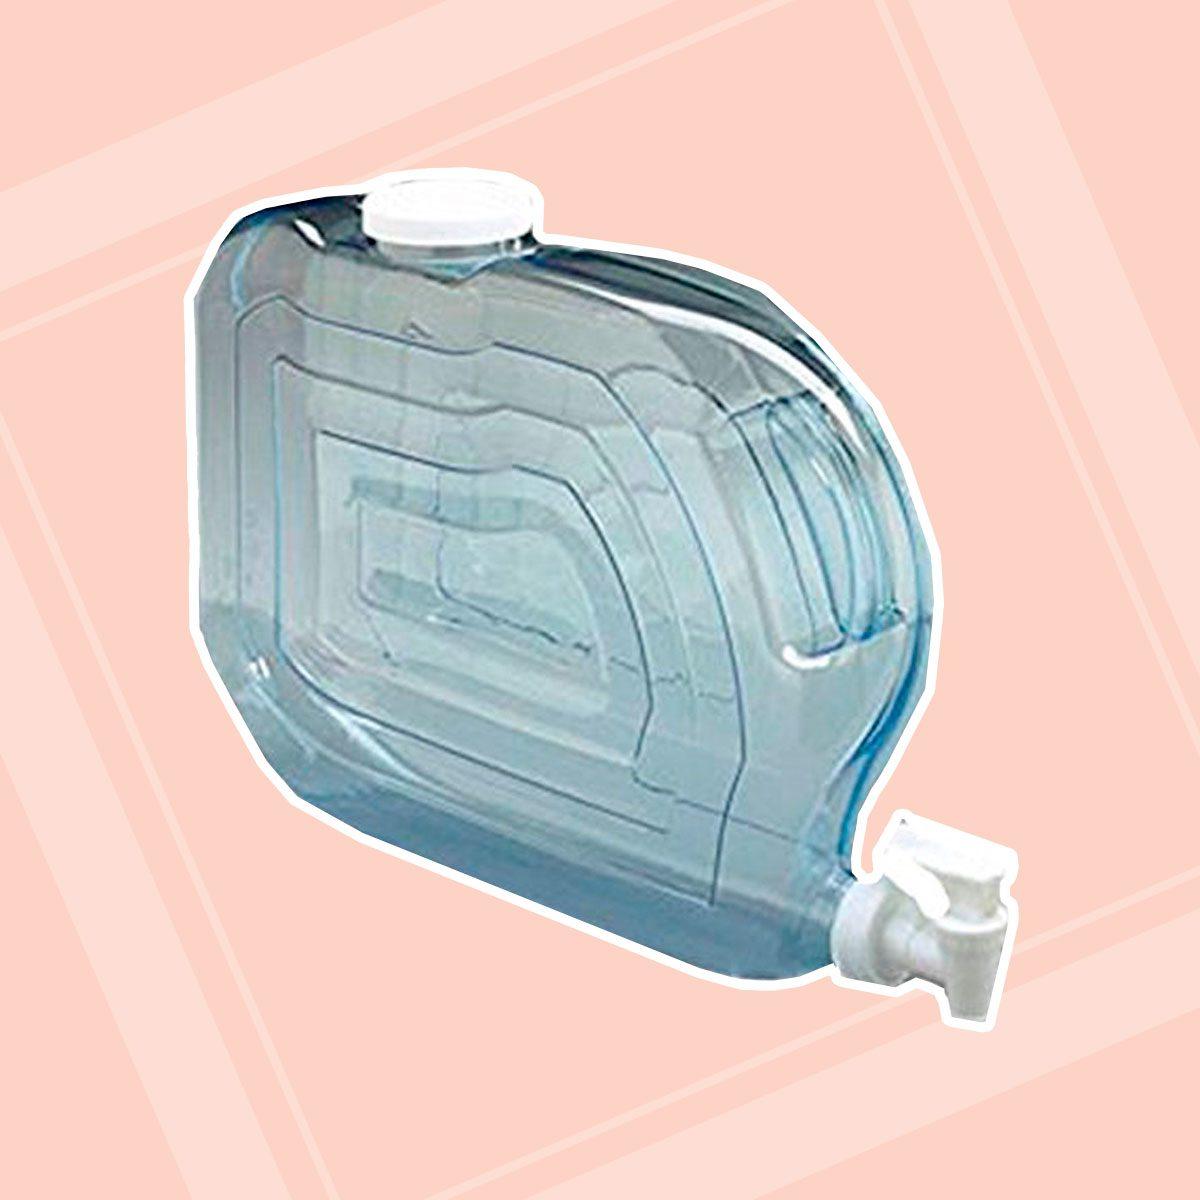 Arrow Home Products Ultra Slimline Beverage Dispenser